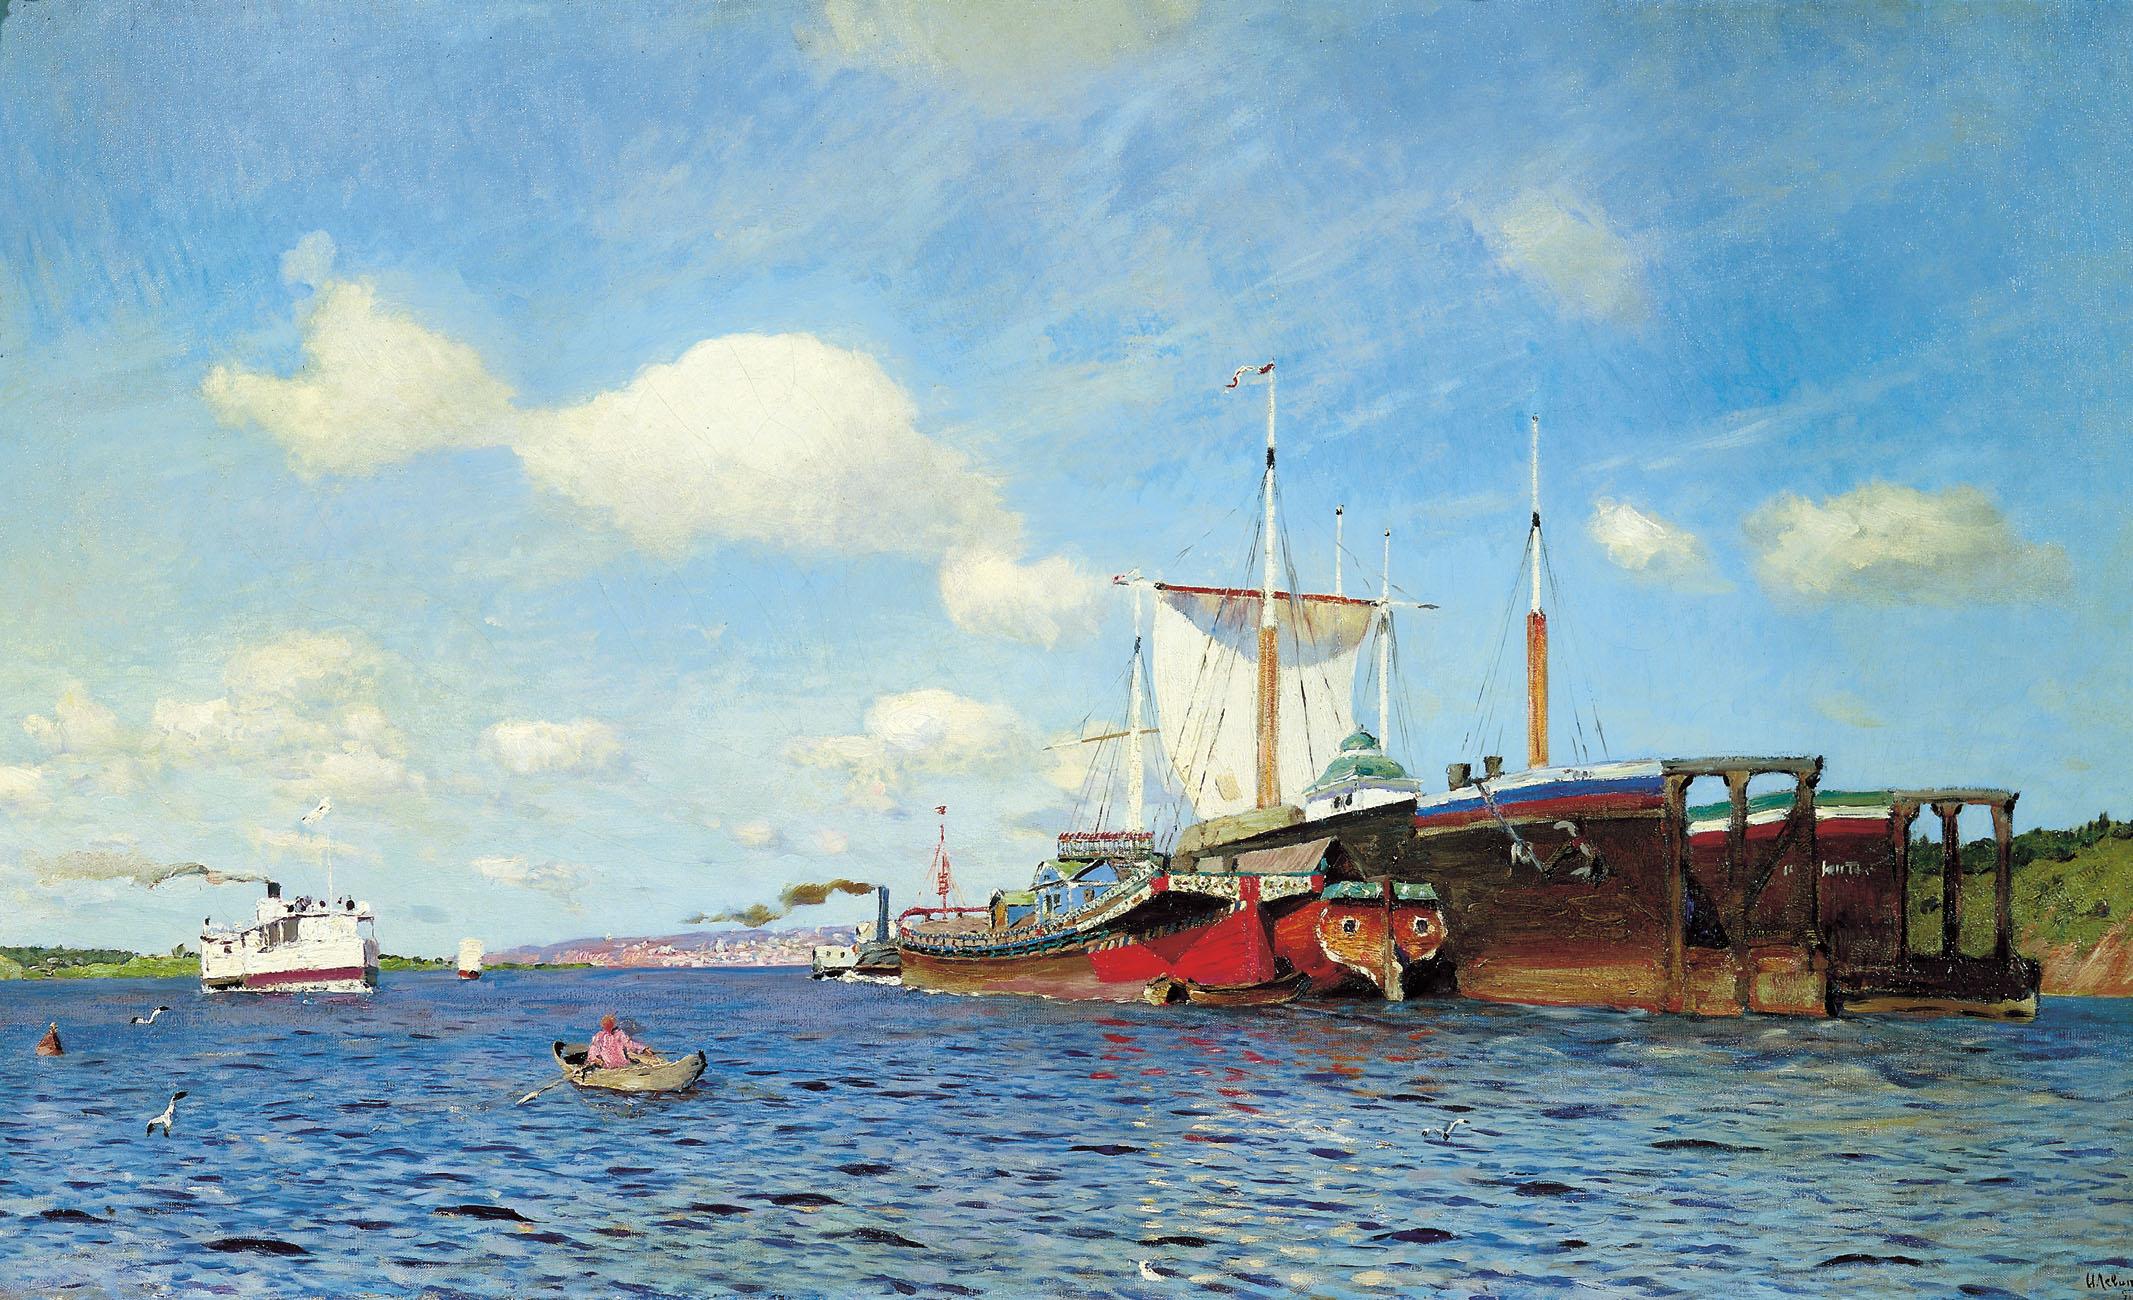 Подборка картин Исаака Левитана (13 работ) » Картины, художники, фотографы на Nevsepic